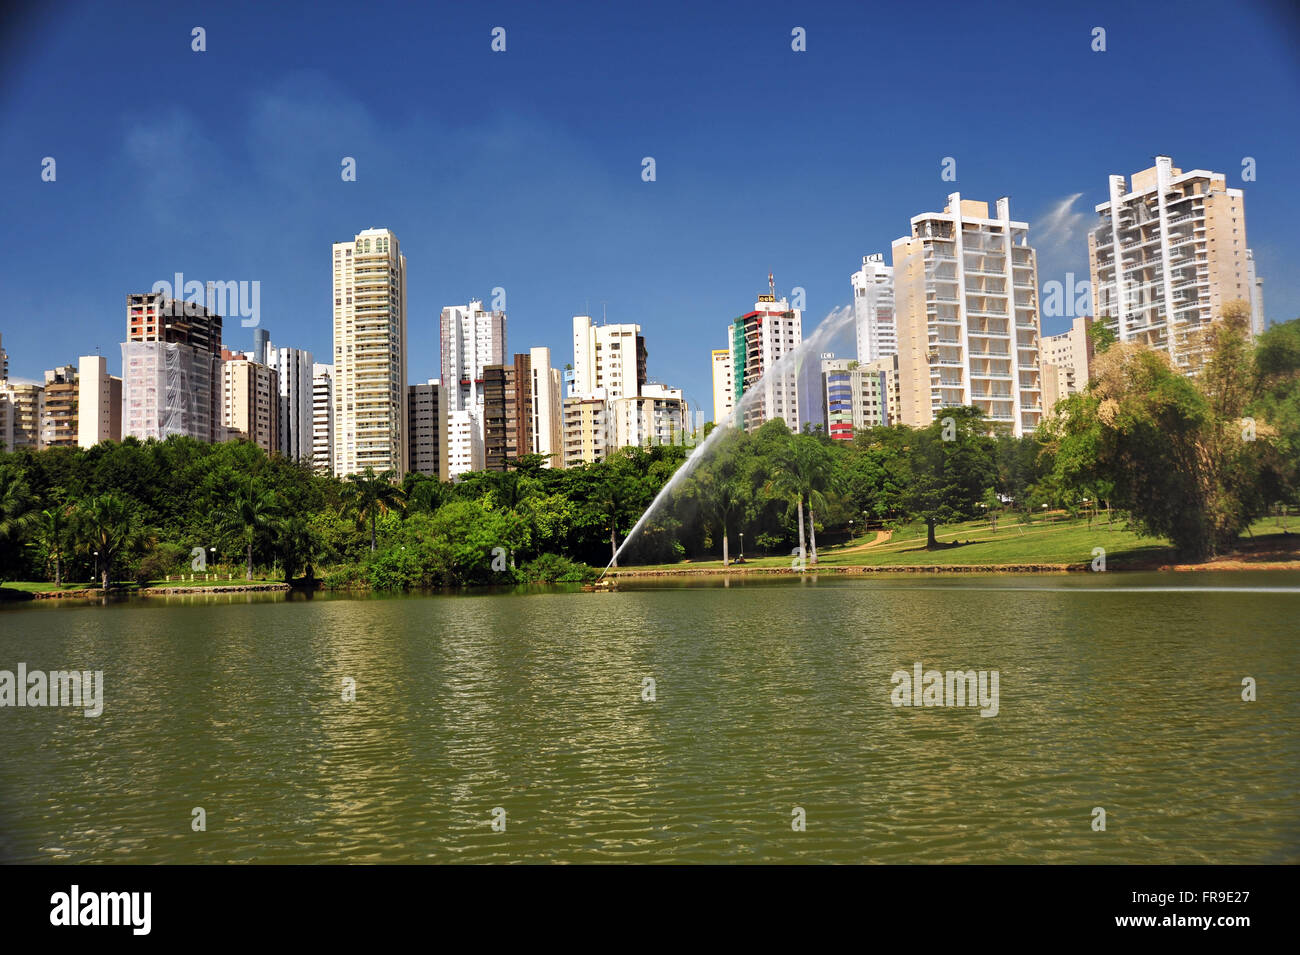 Vaca Brava Park City Goiania - Stock Image